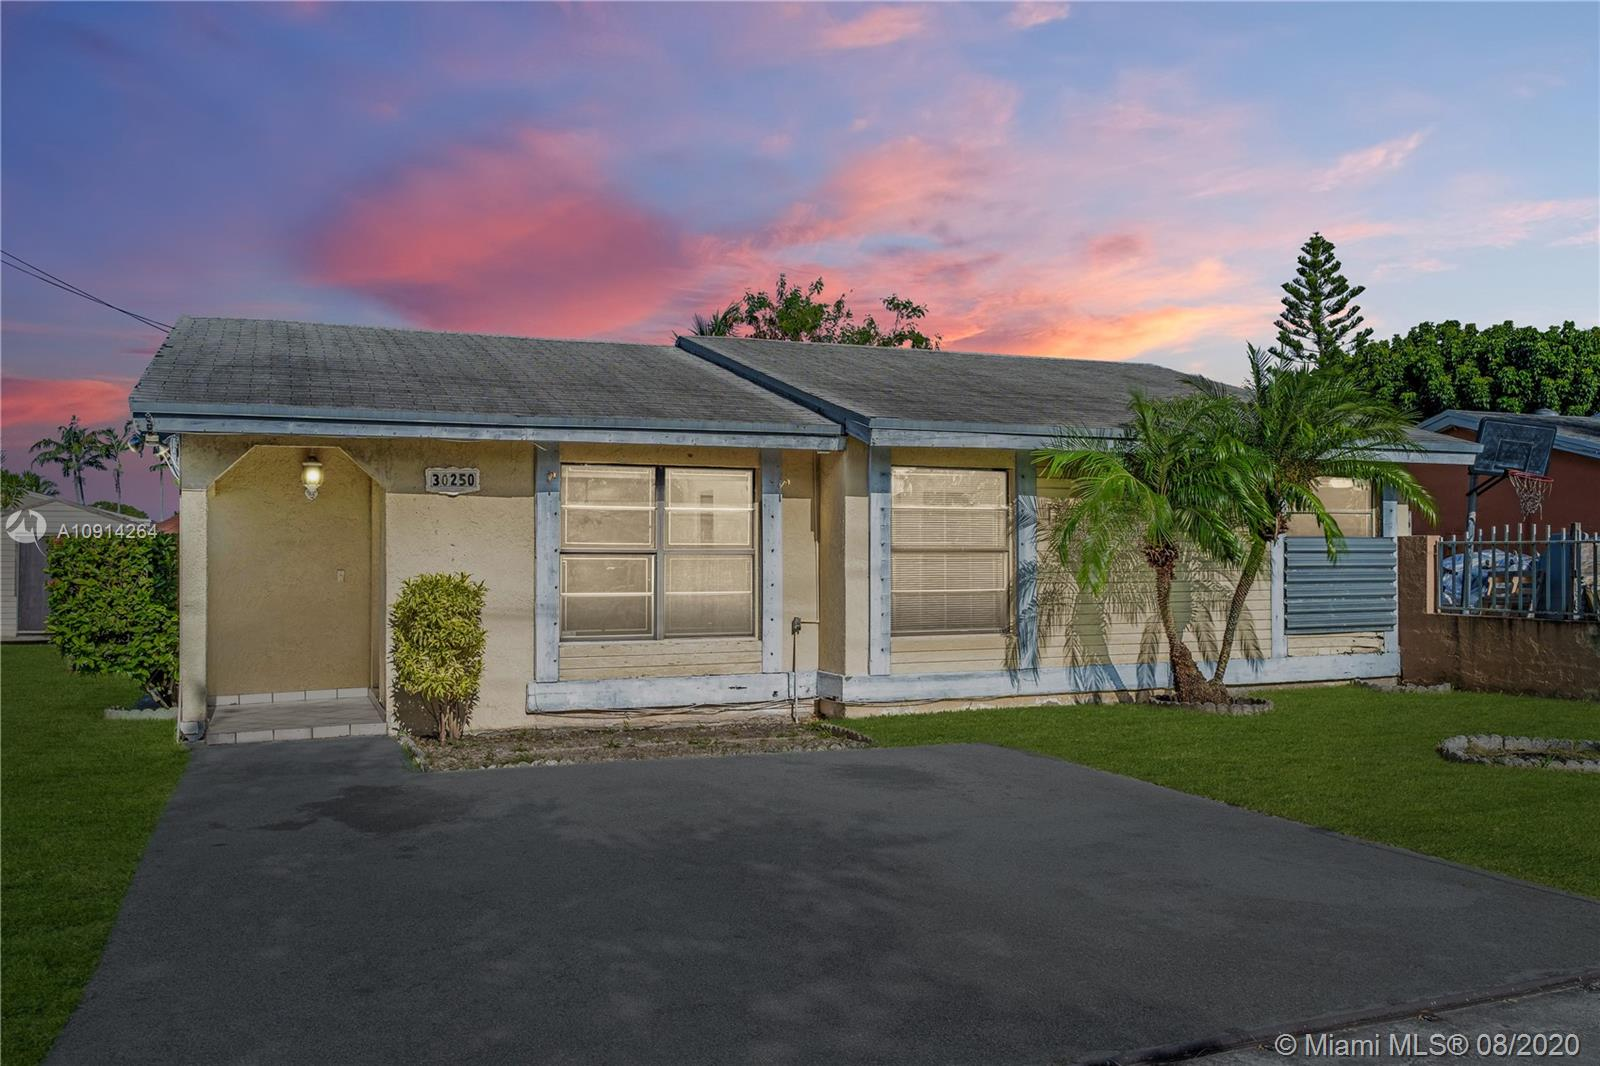 30250 SW 162nd Ave Property Photo